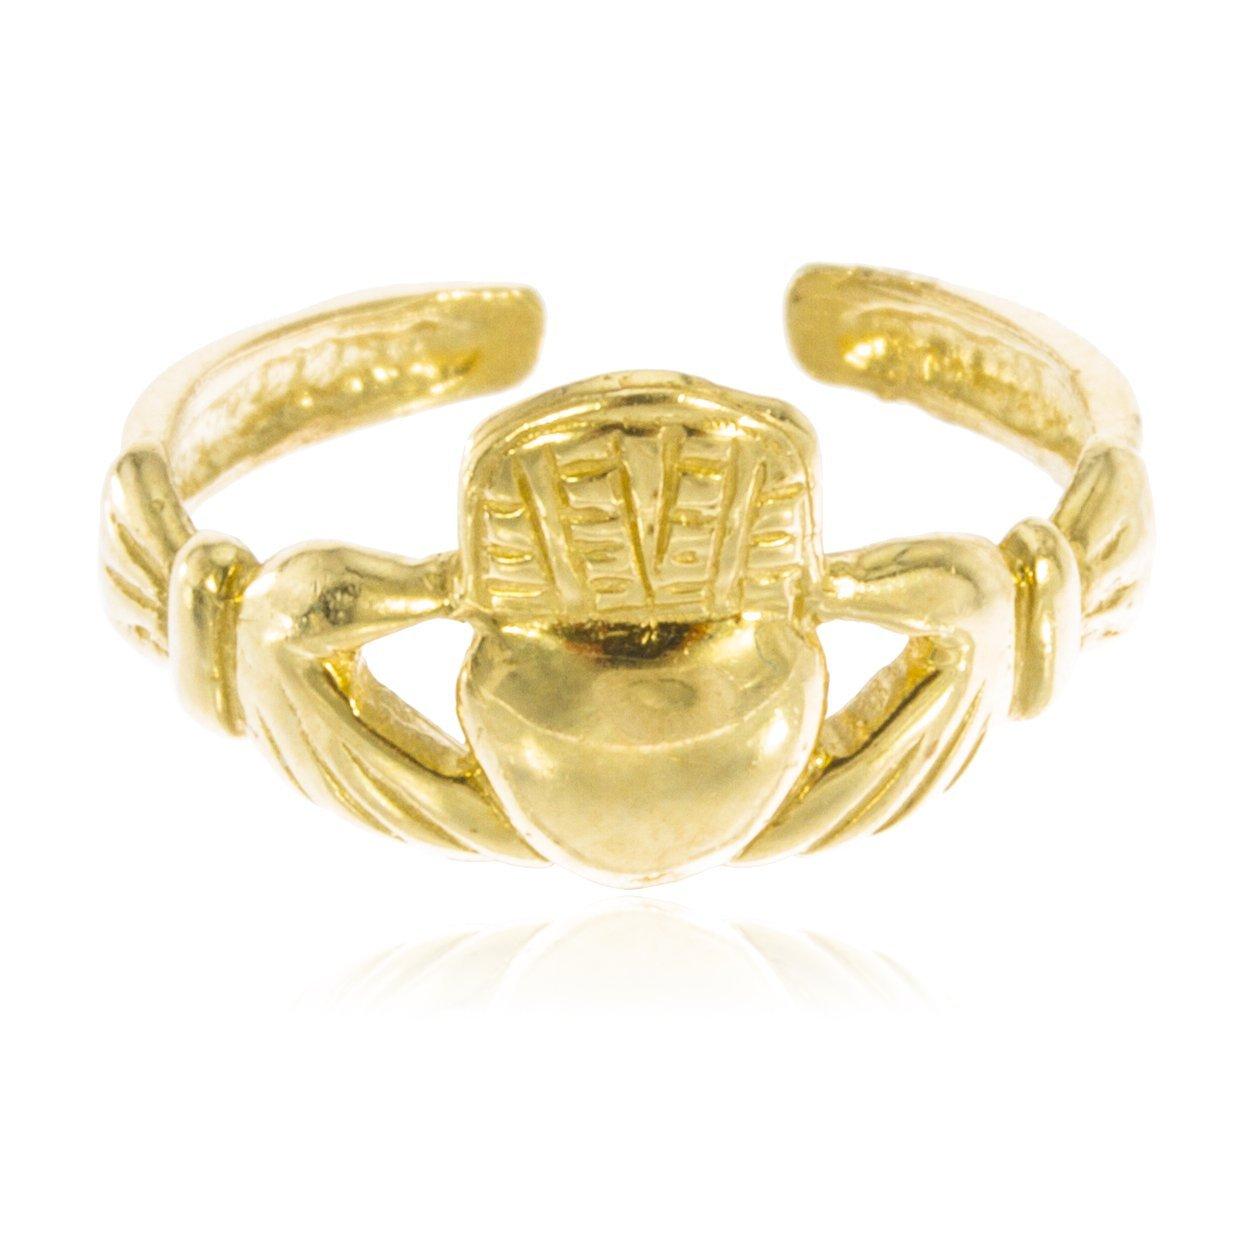 JOTW 10k Yellow Gold Irish Claddagh Toe Ring GO-488